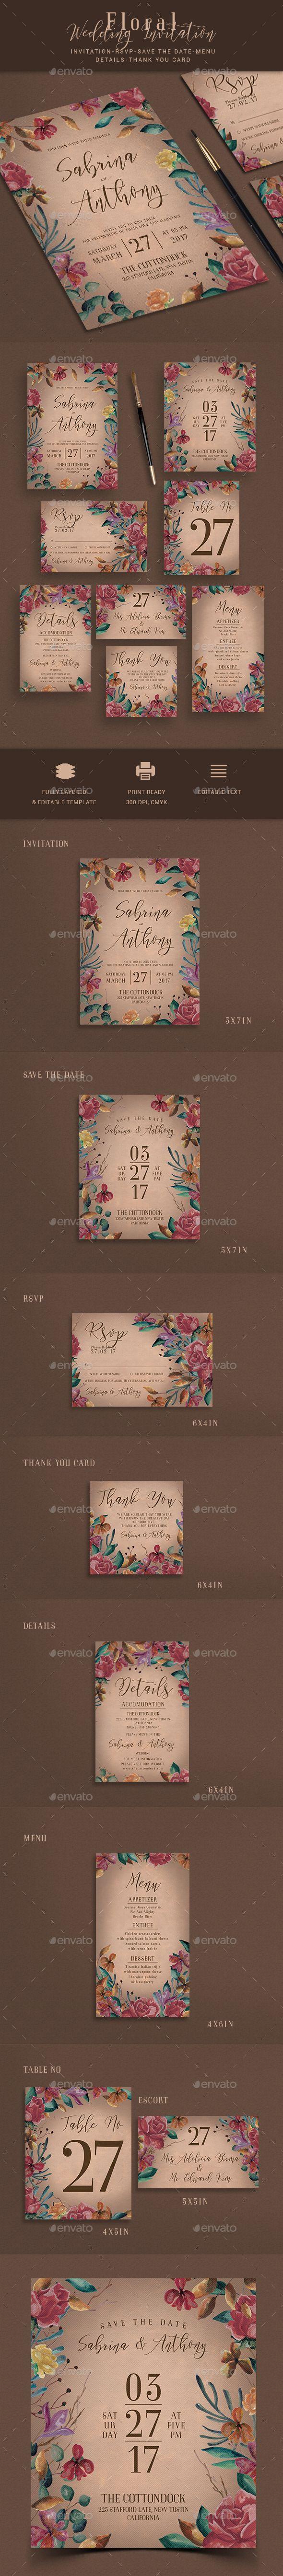 card templates for wedding invitation%0A Wedding Invitation